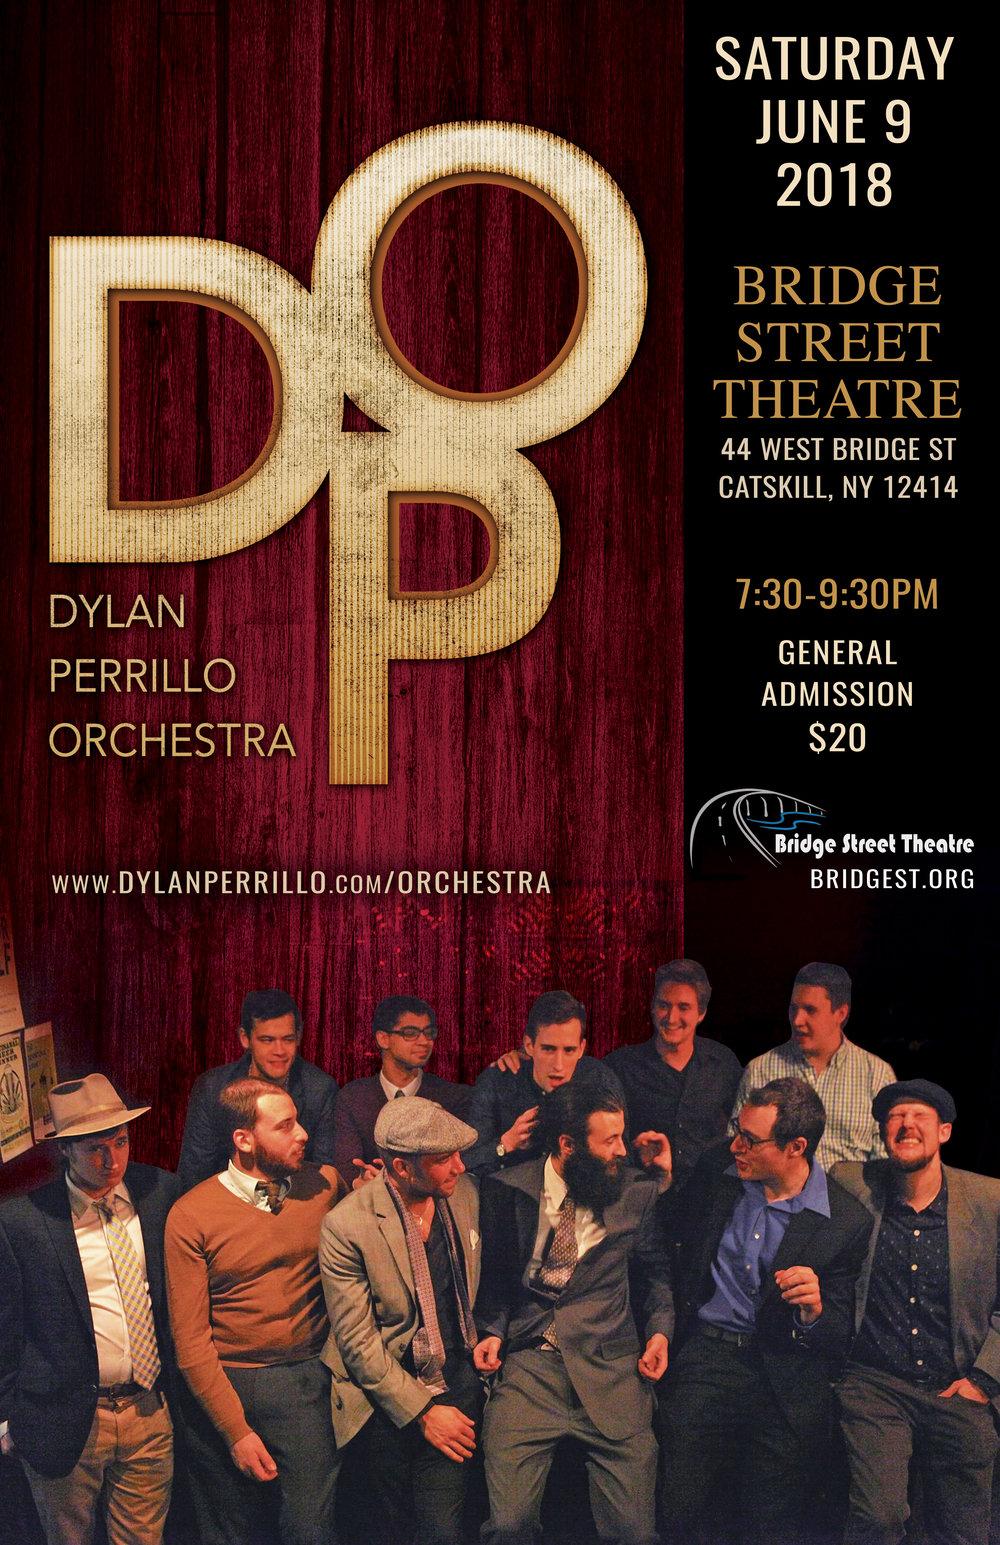 Dylan Perrillo Orchestra Brideg St June.jpg